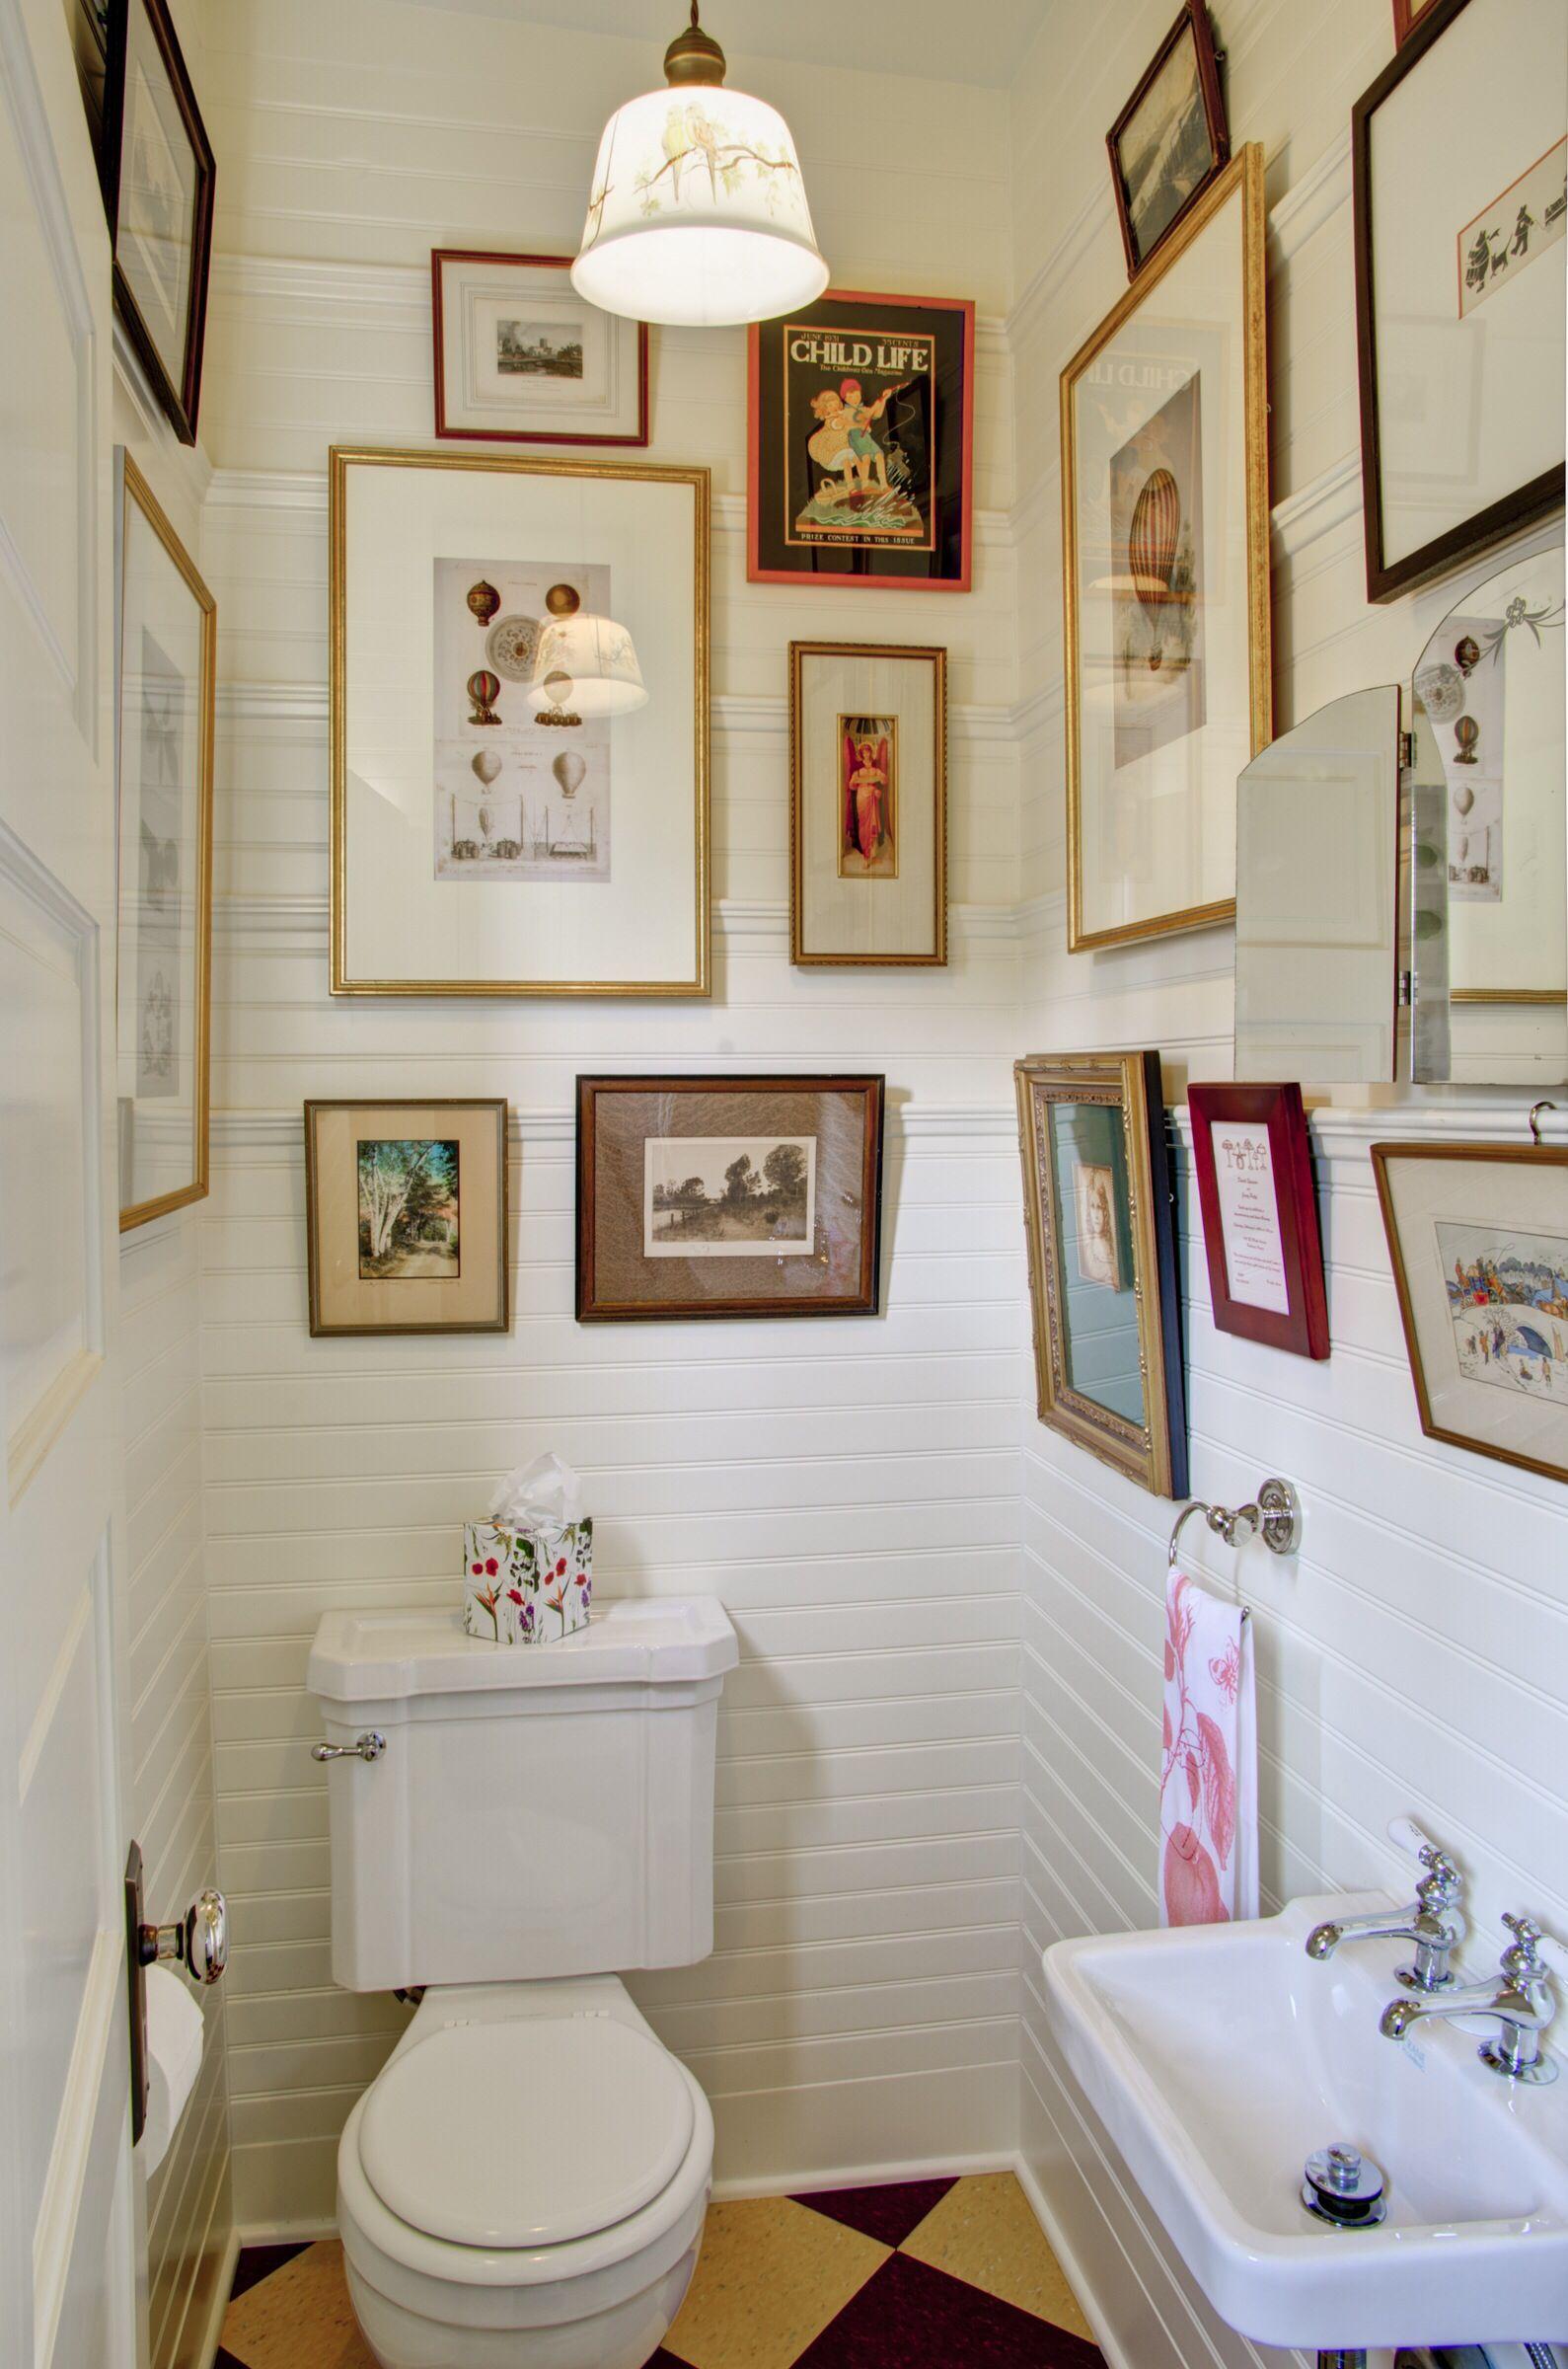 pin by kris wagner on wall art bathroom wall decor tiny on bathroom wall decor id=40414